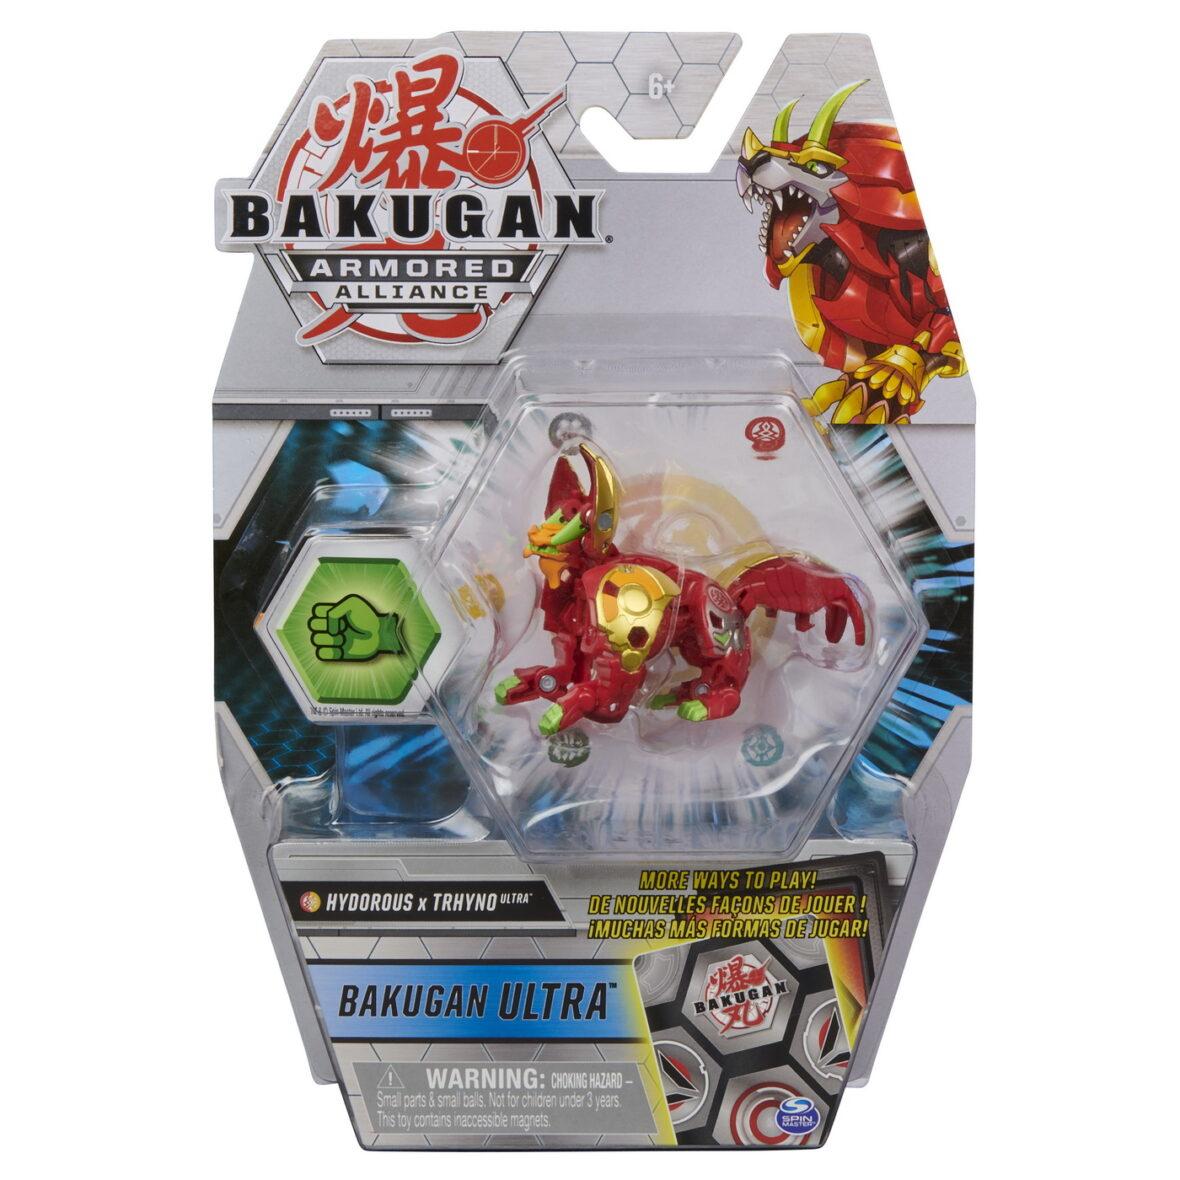 Bakugan S2 Bila Ultra Hydorous Trhyno Cu Card Baku-gear